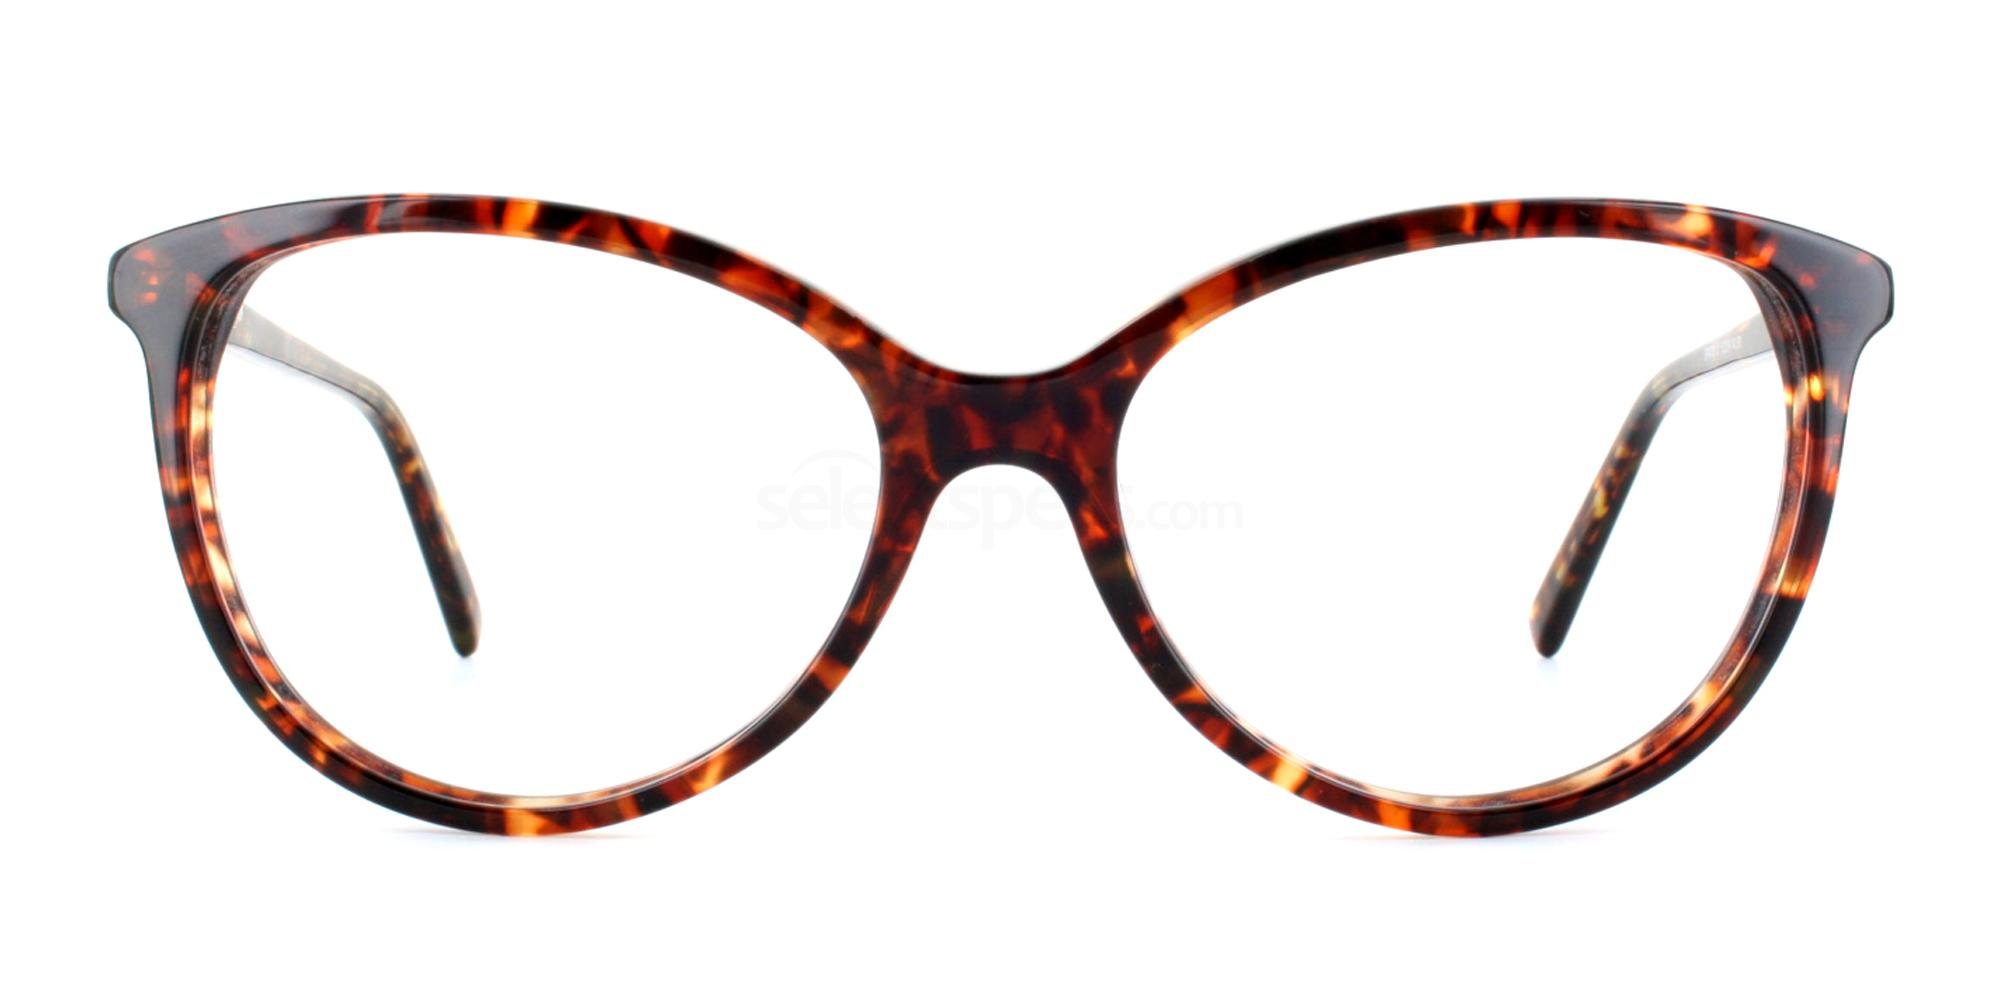 C1 SRA129 Glasses, SelectSpecs